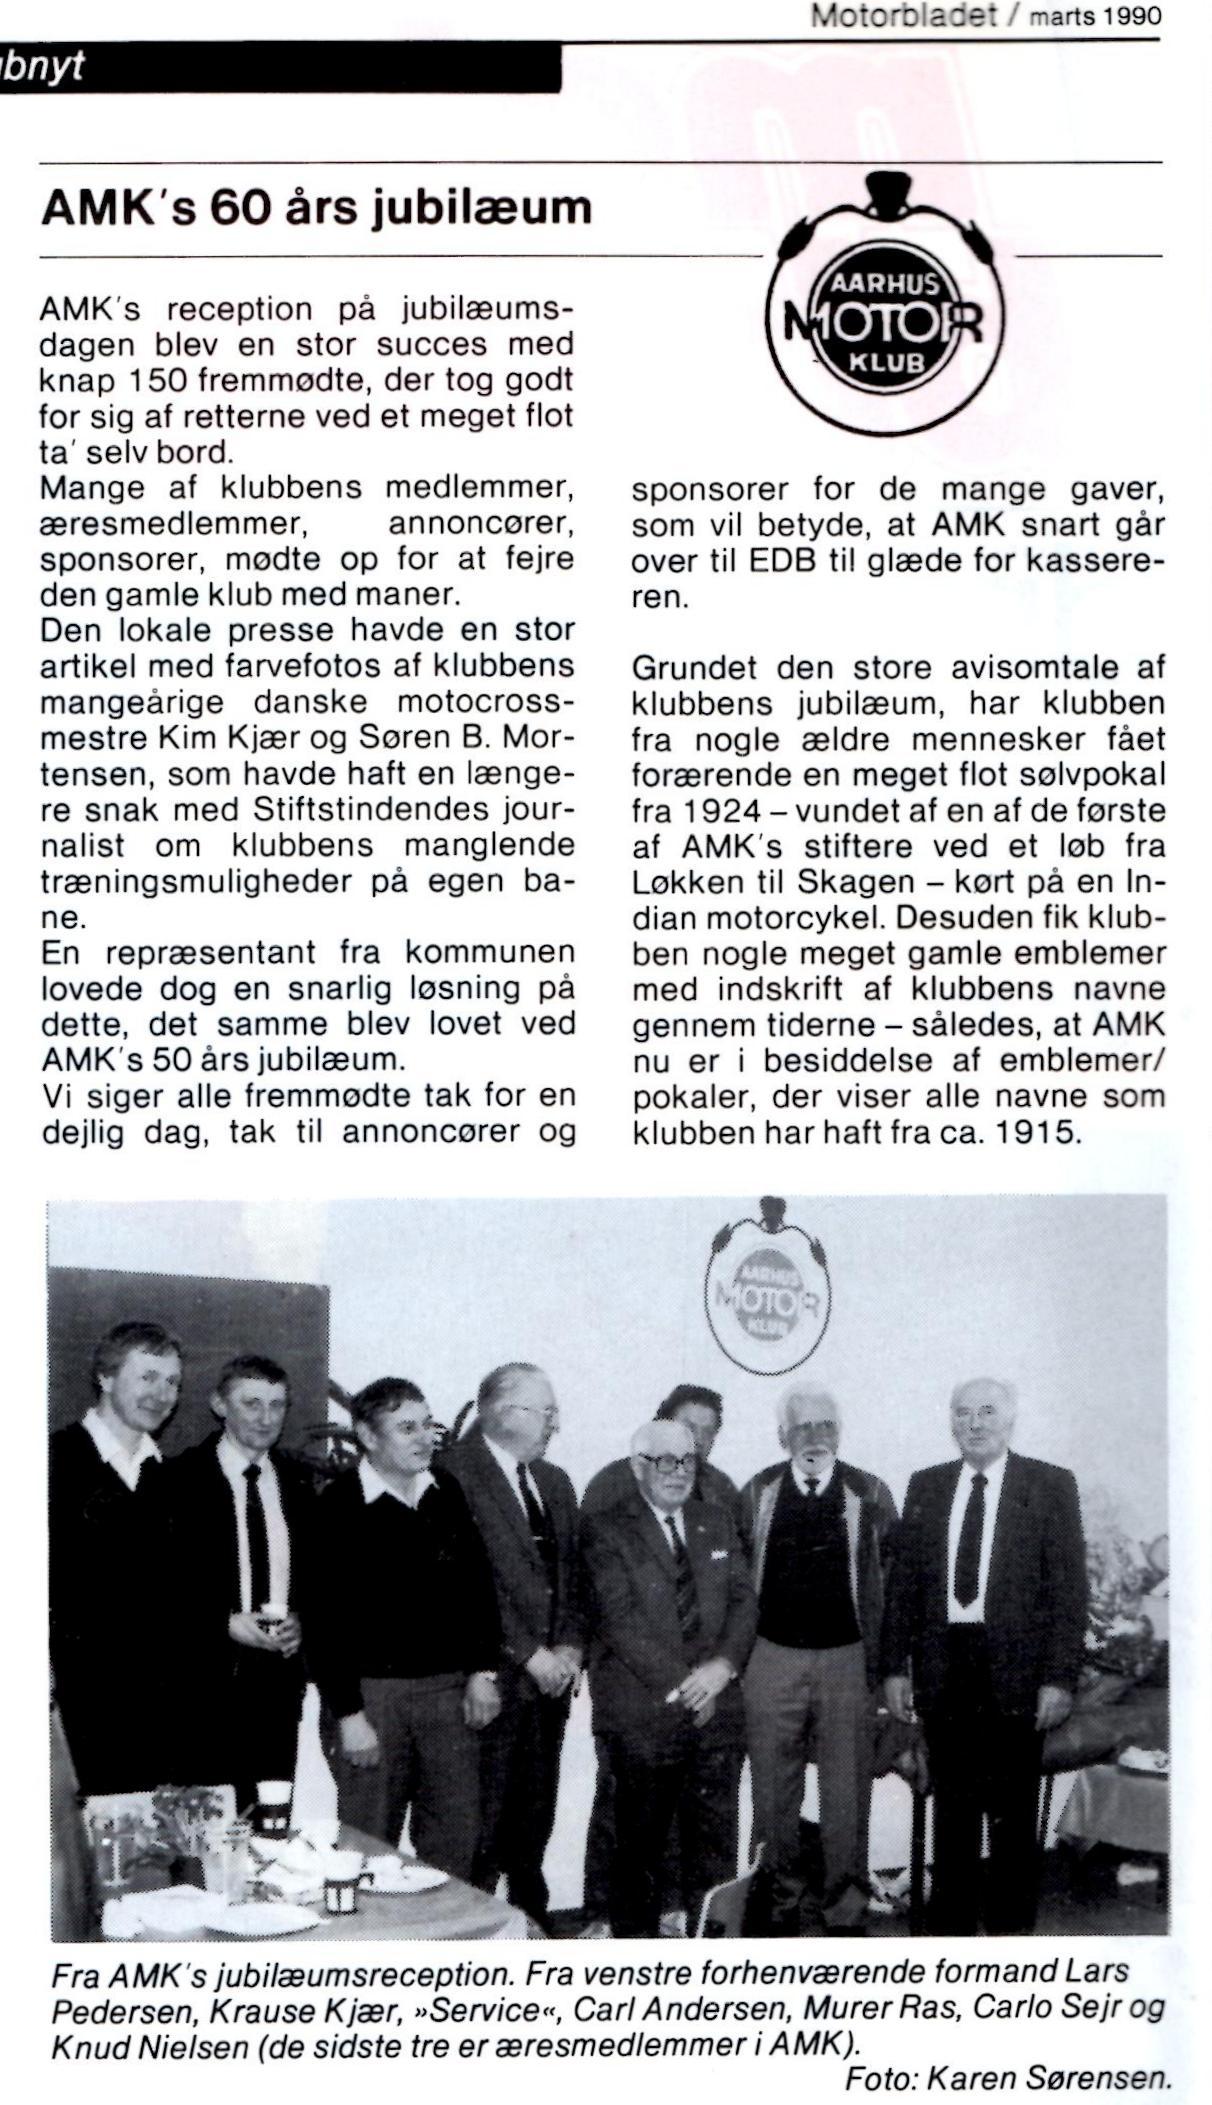 Omtale marts 1990